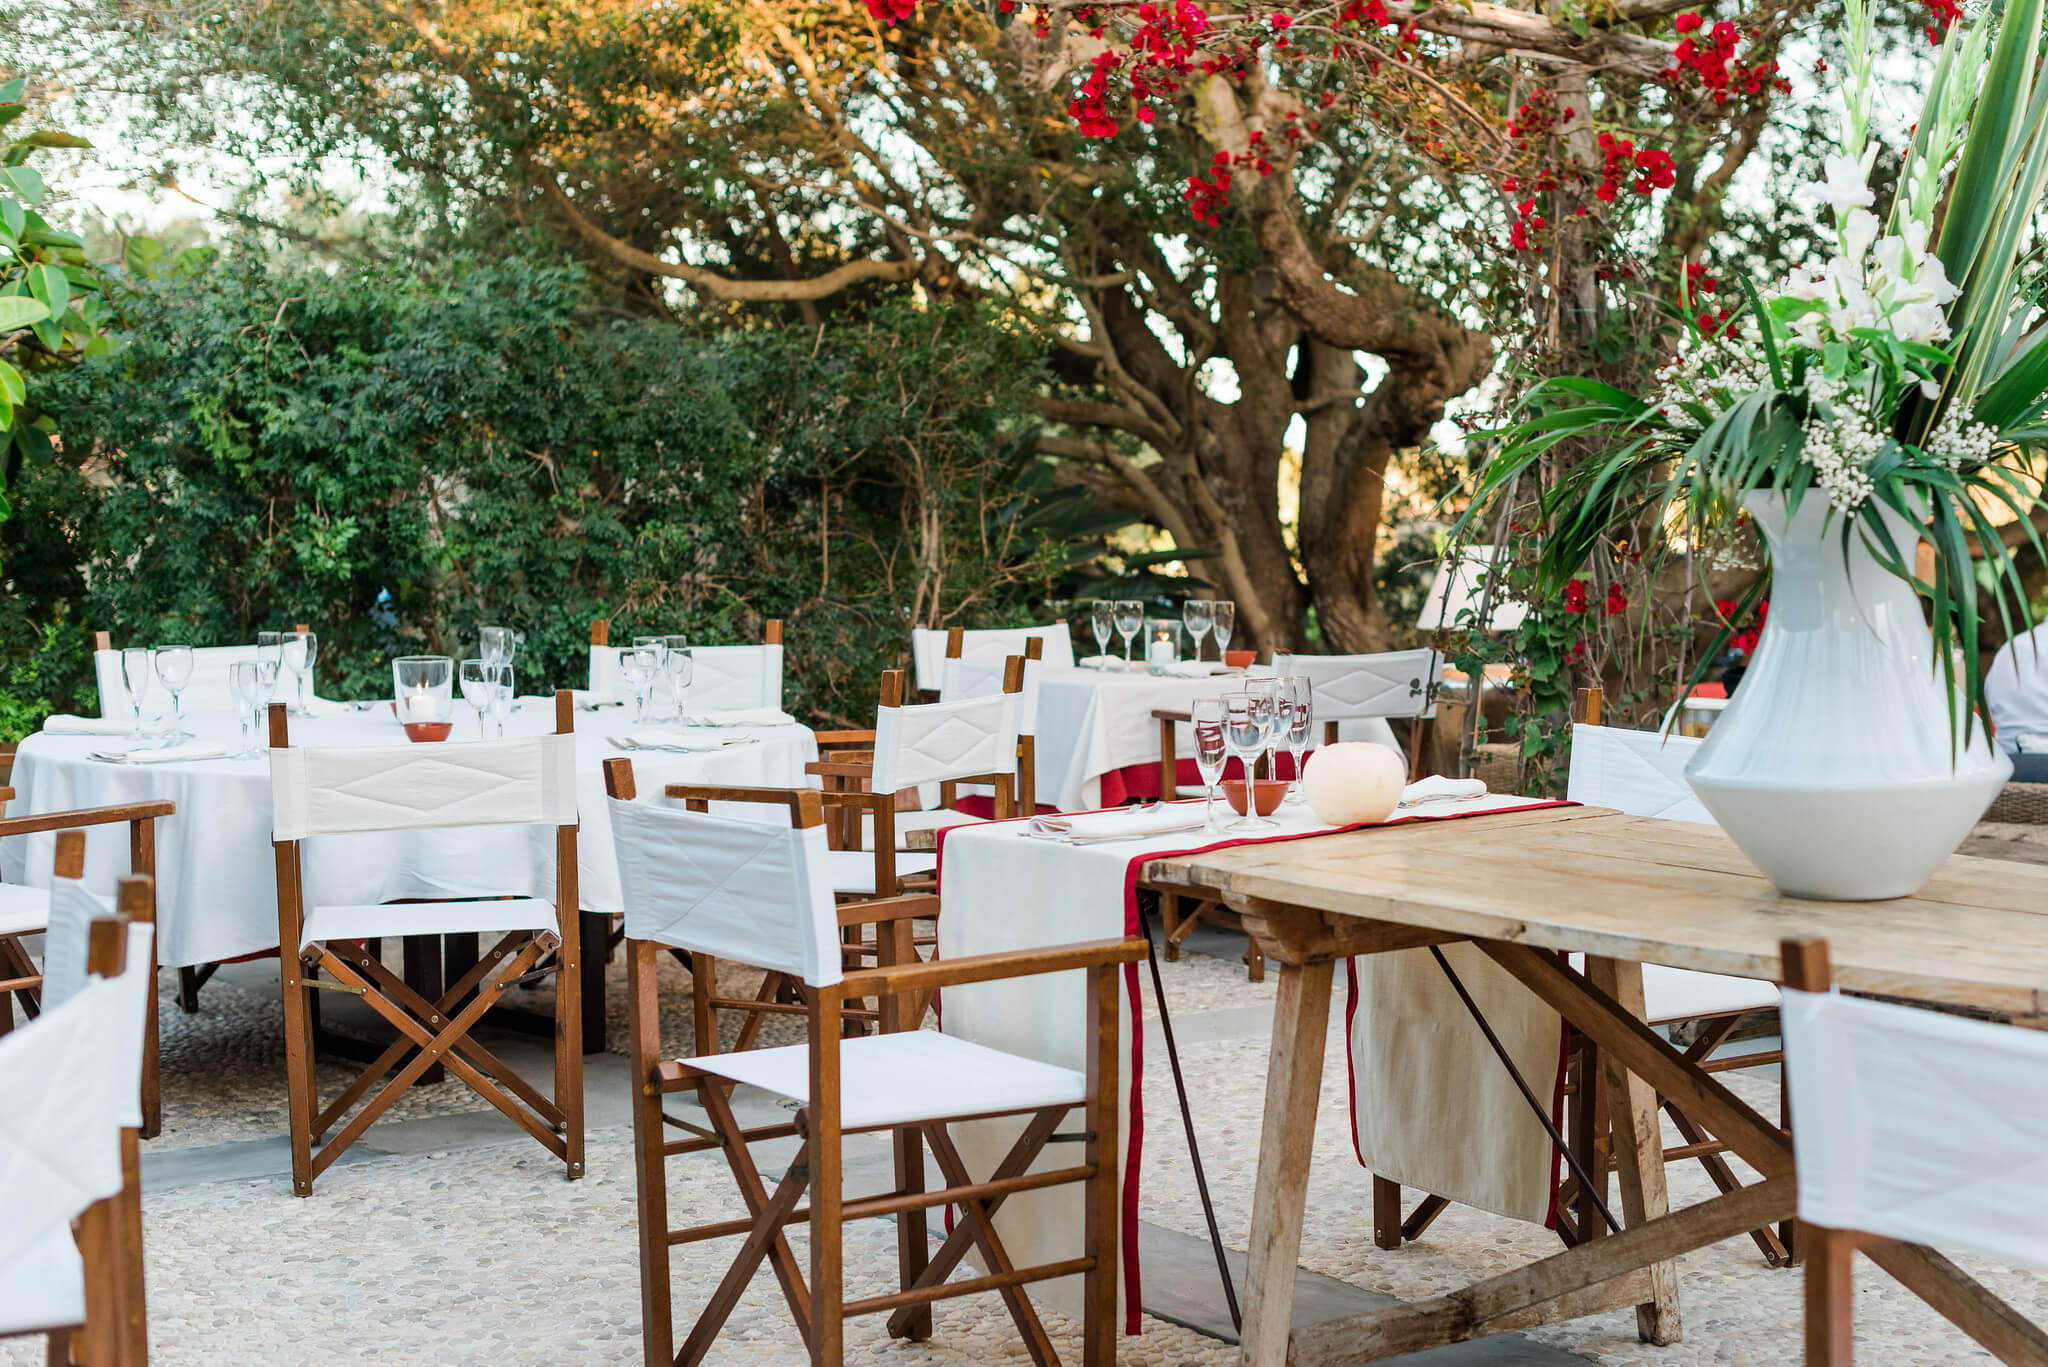 https://www.white-ibiza.com/wp-content/uploads/2020/03/formentera-restaurants-can-carlos-2020-07.jpg